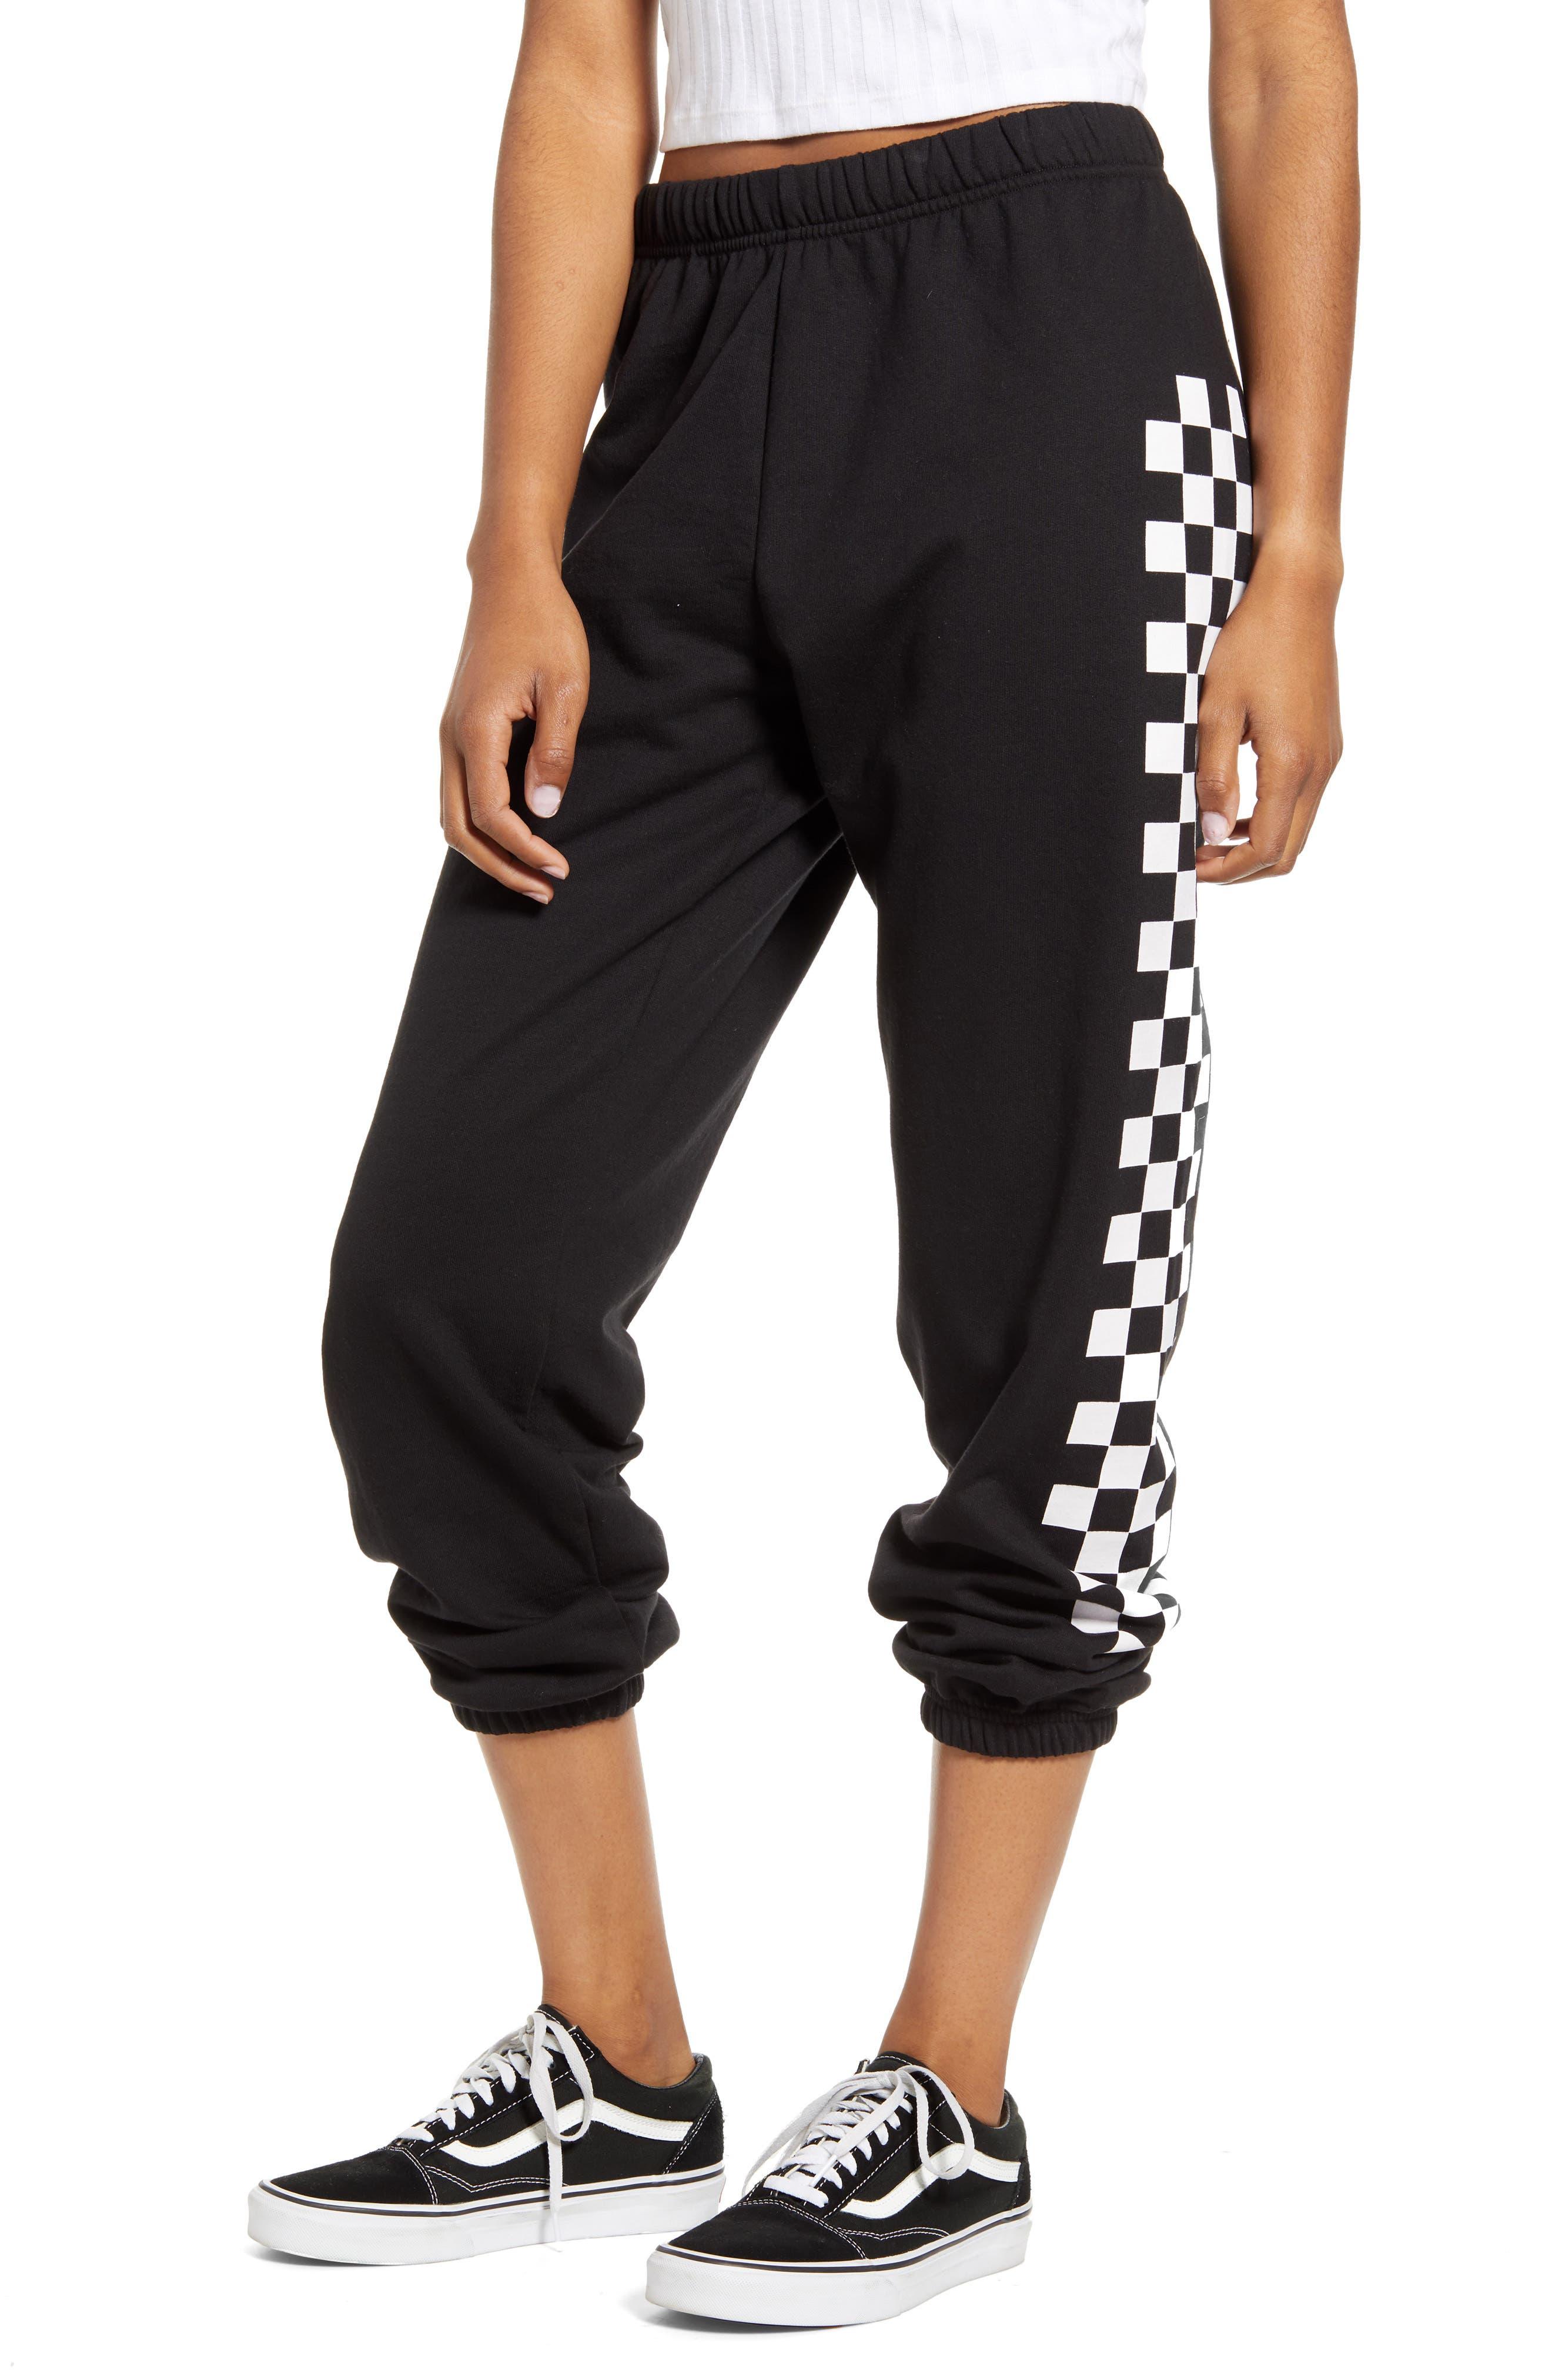 Women's Sub Urban Riot Checkered Stripe Crop Sweatpants